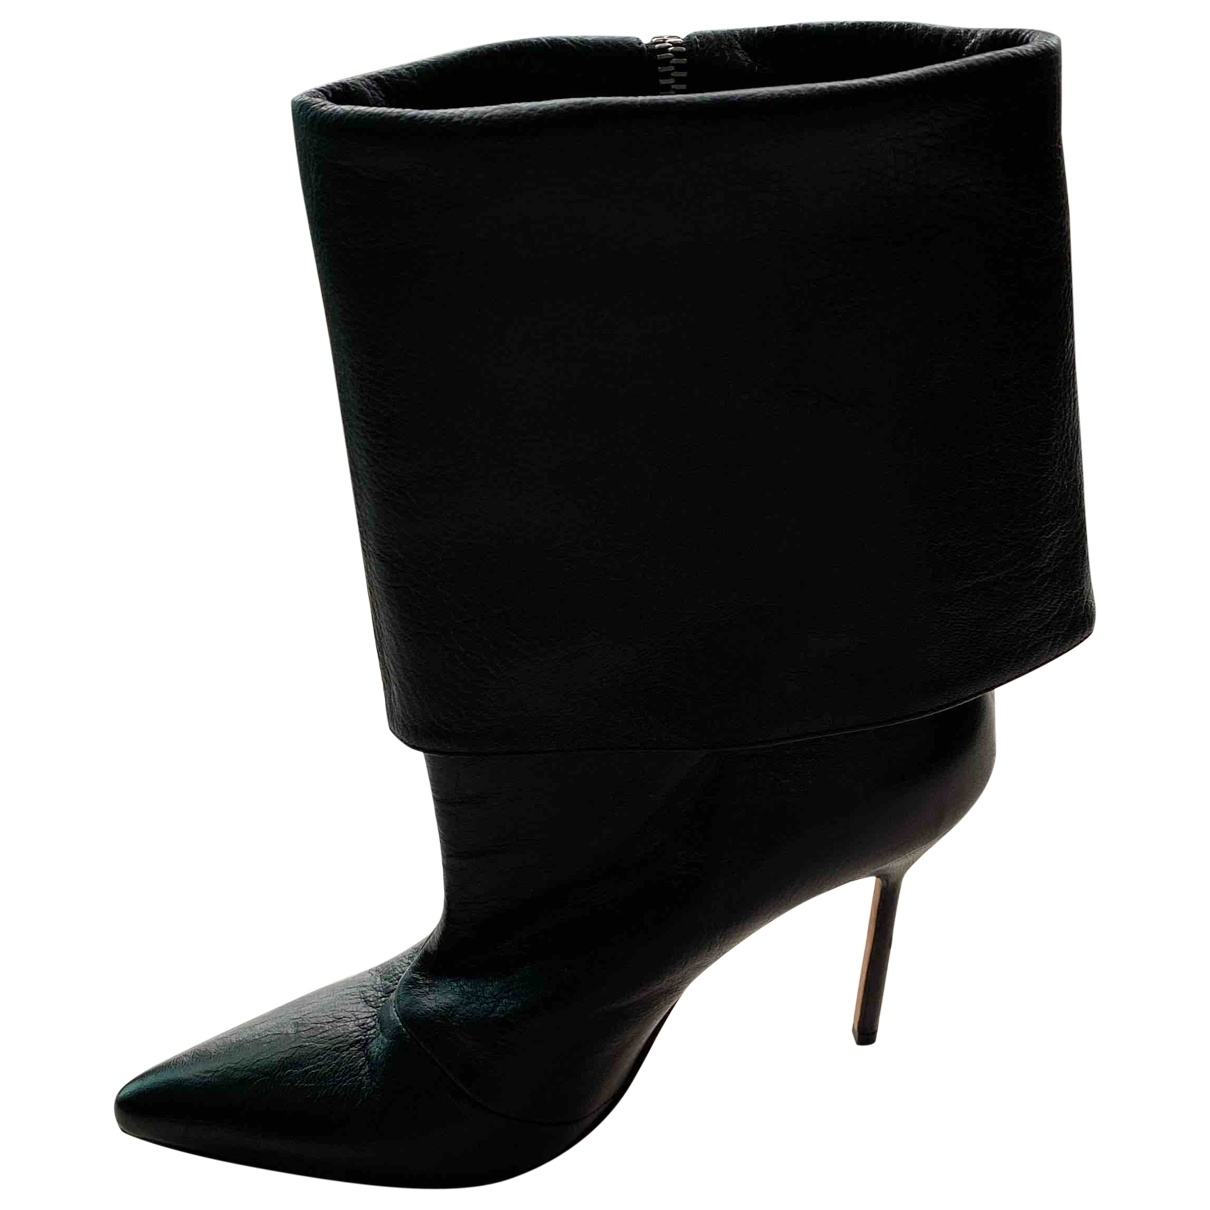 Manolo Blahnik \N Black Leather Boots for Women 37 EU